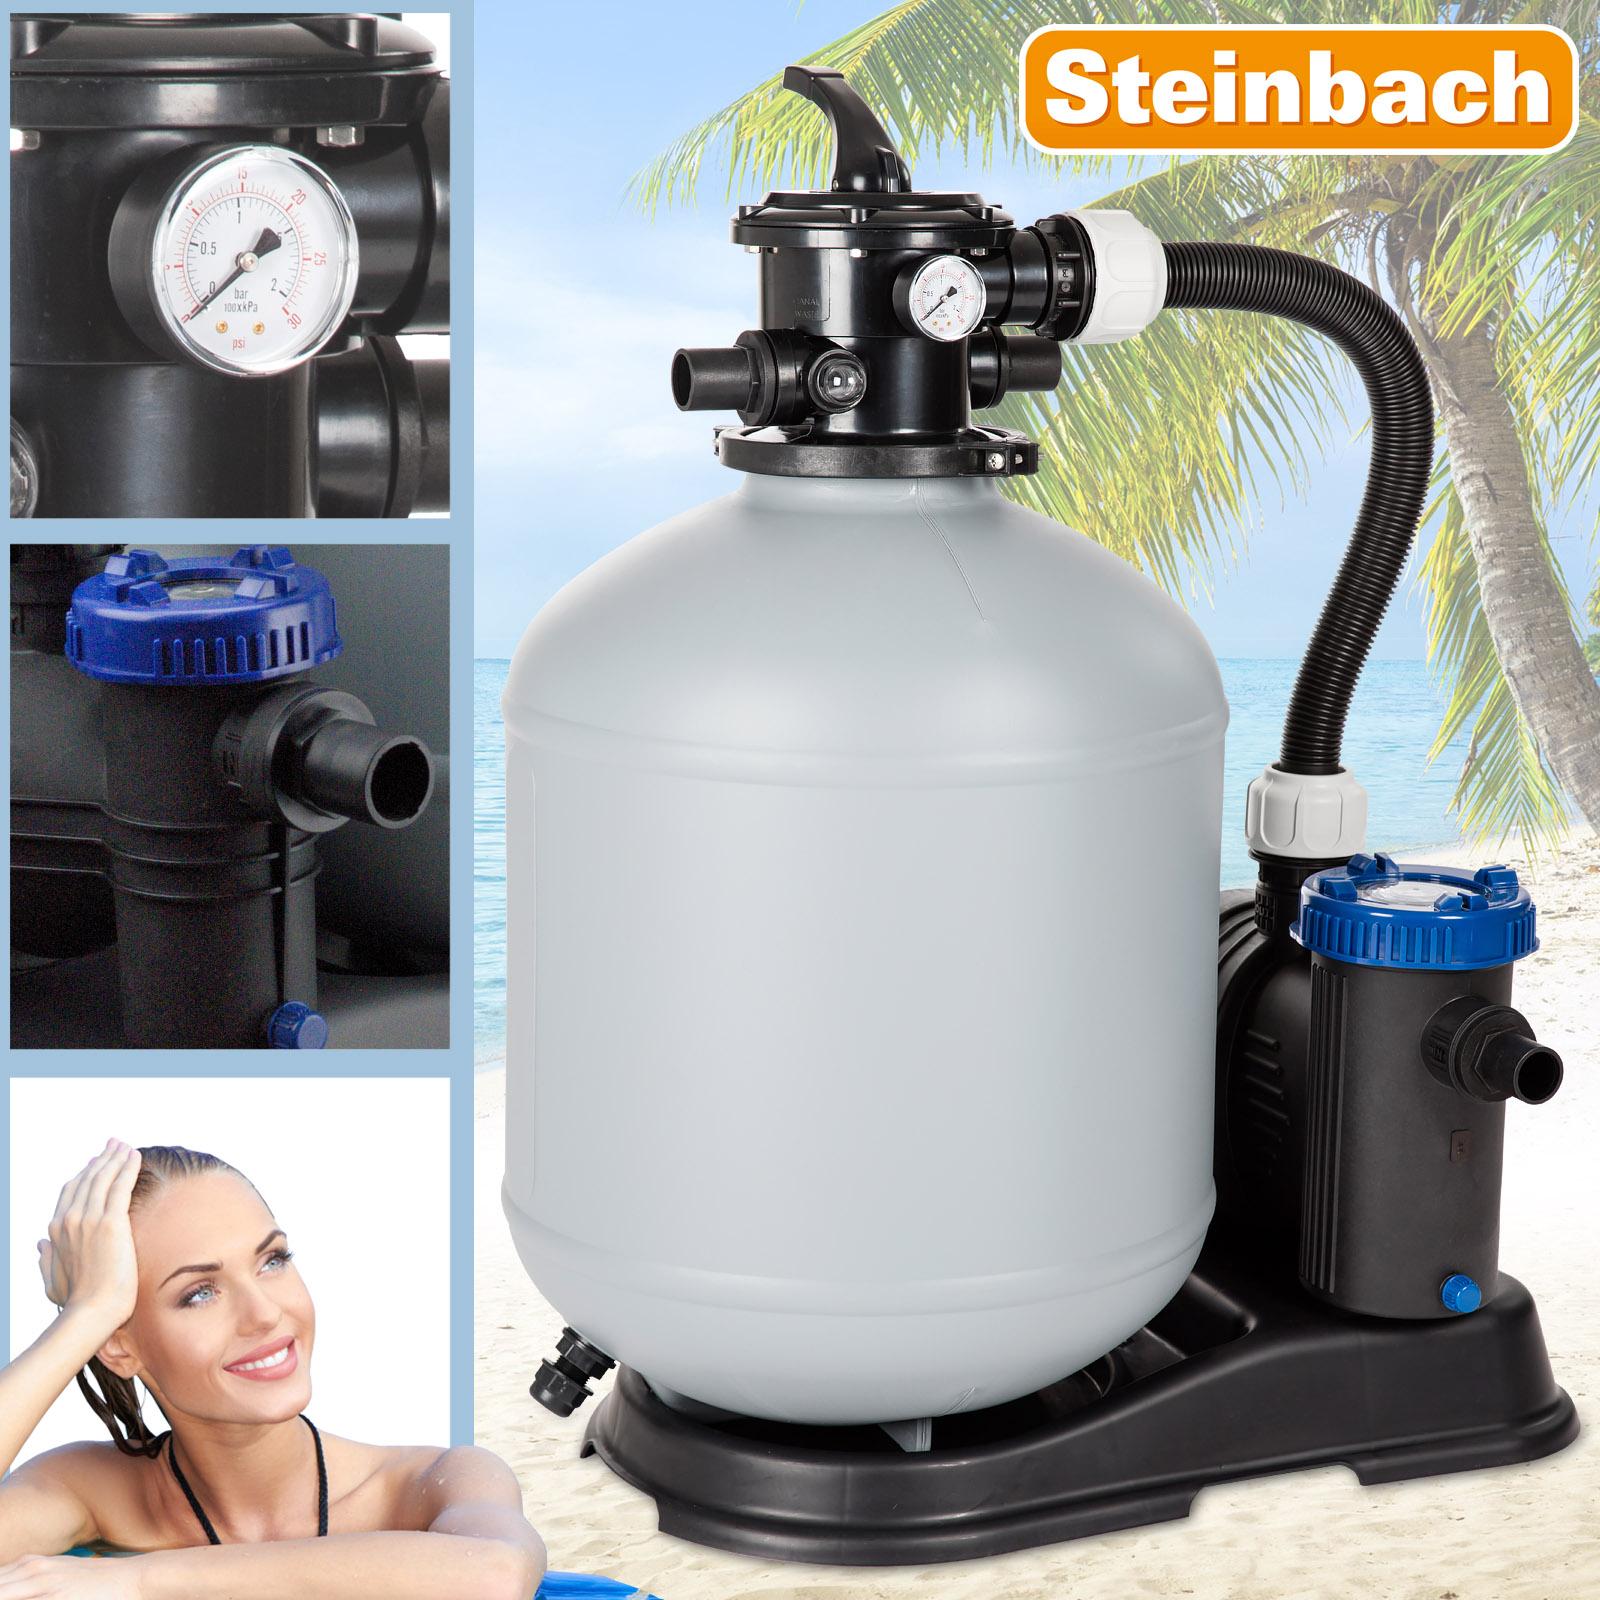 Steinbach Sandfilteranlage 14m³ Eco Top10 Pool Pumpe Filterpumpe Filter